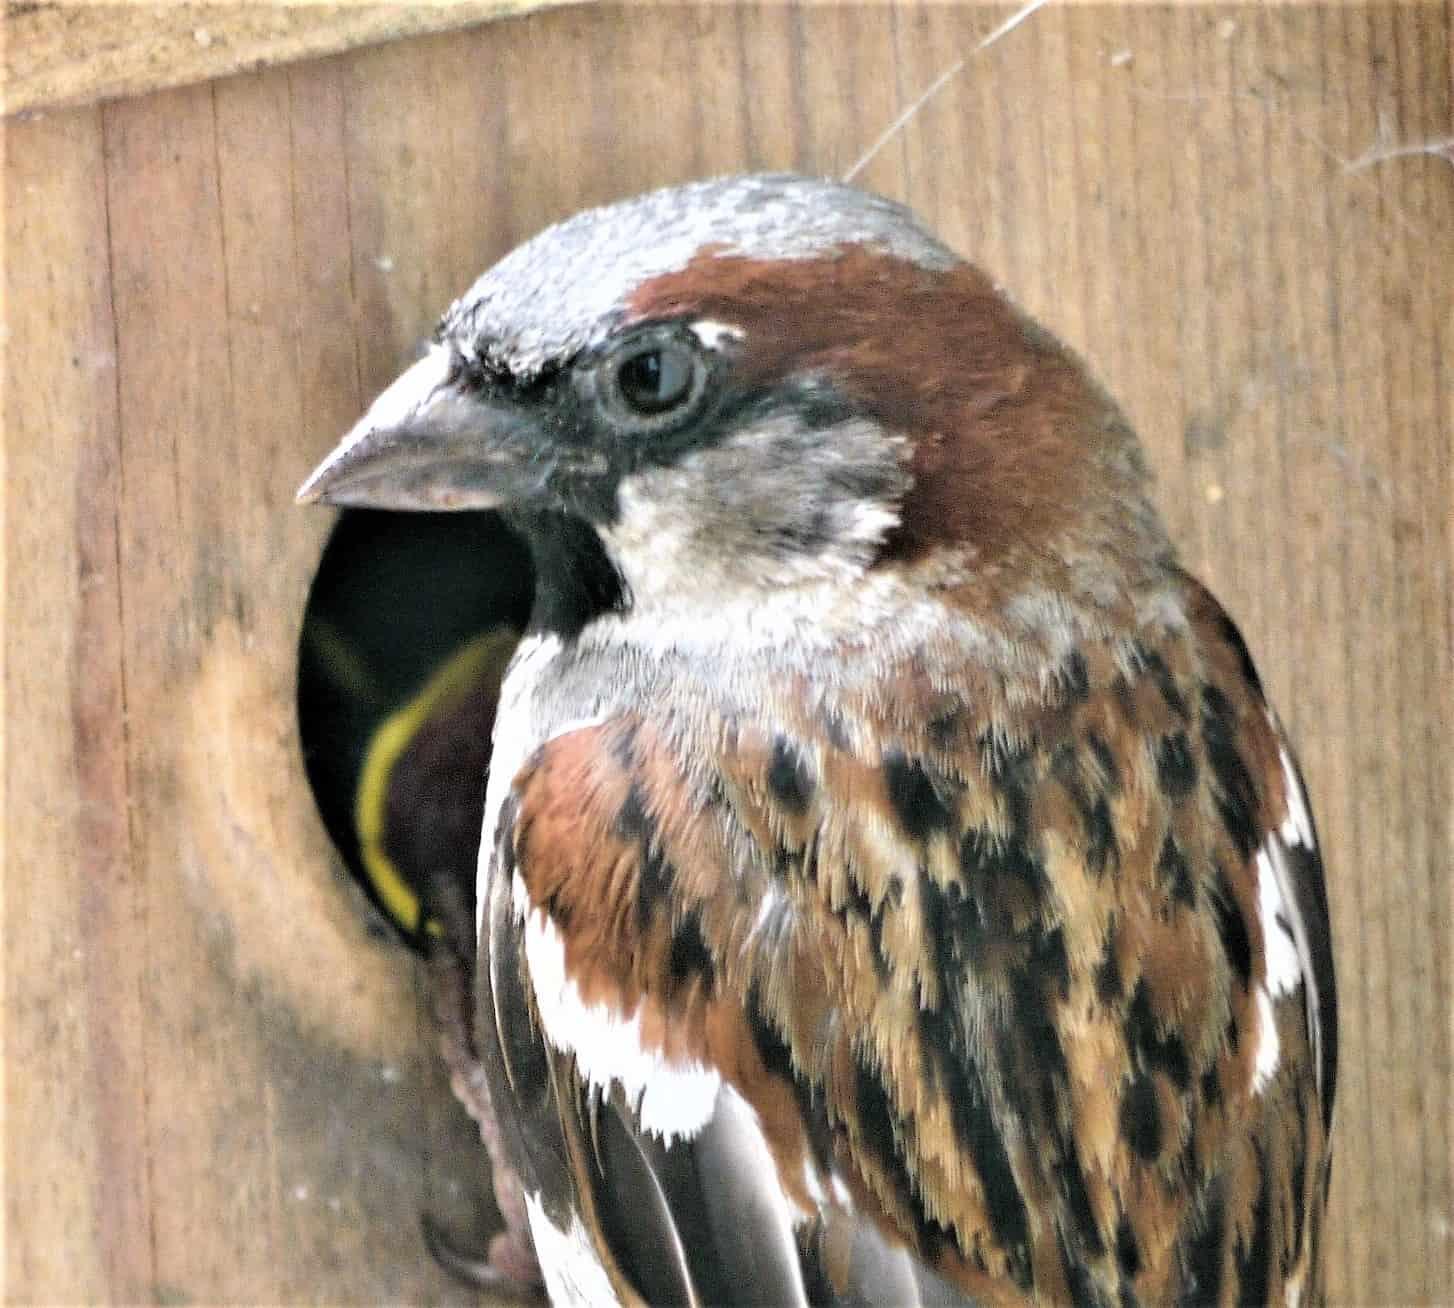 All about the House sparrow - GardenBird